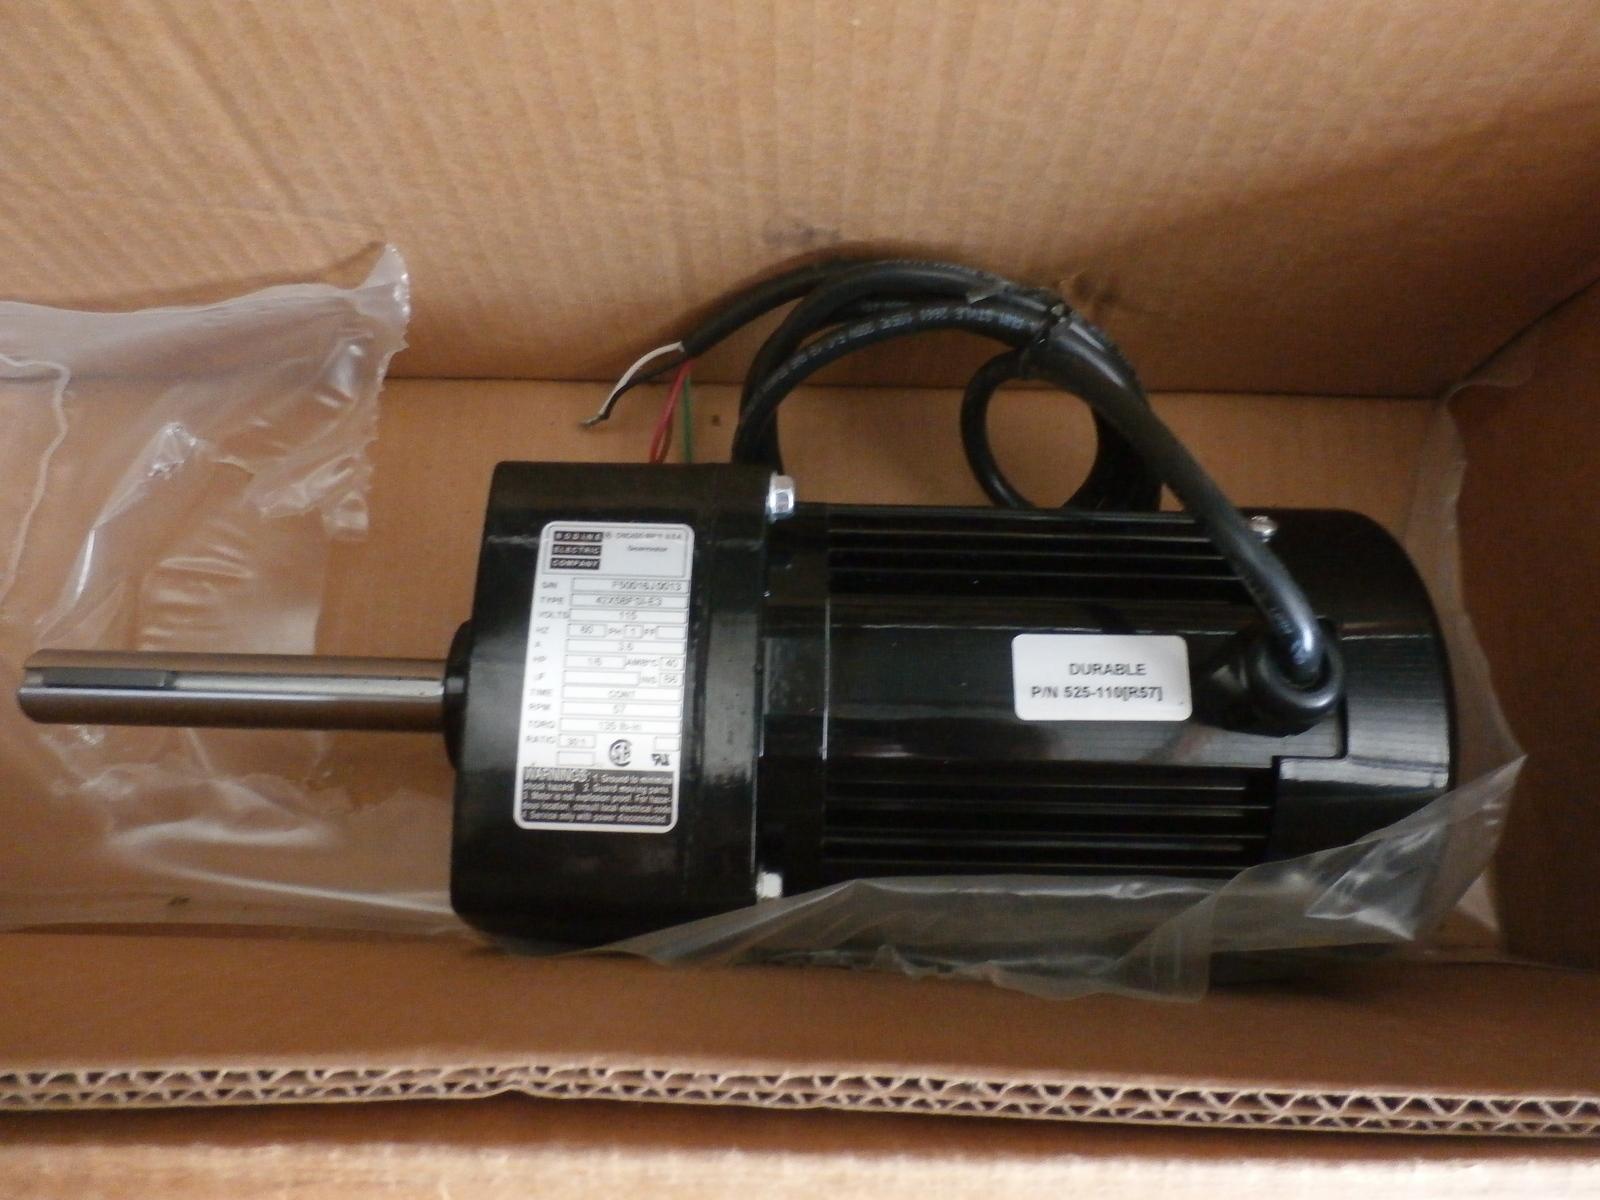 Bodine Electric Co. Gearmotor, 42X5BFS1-E3,V- 115, Hp-1/6, RPM- 57, Ratio 30:1